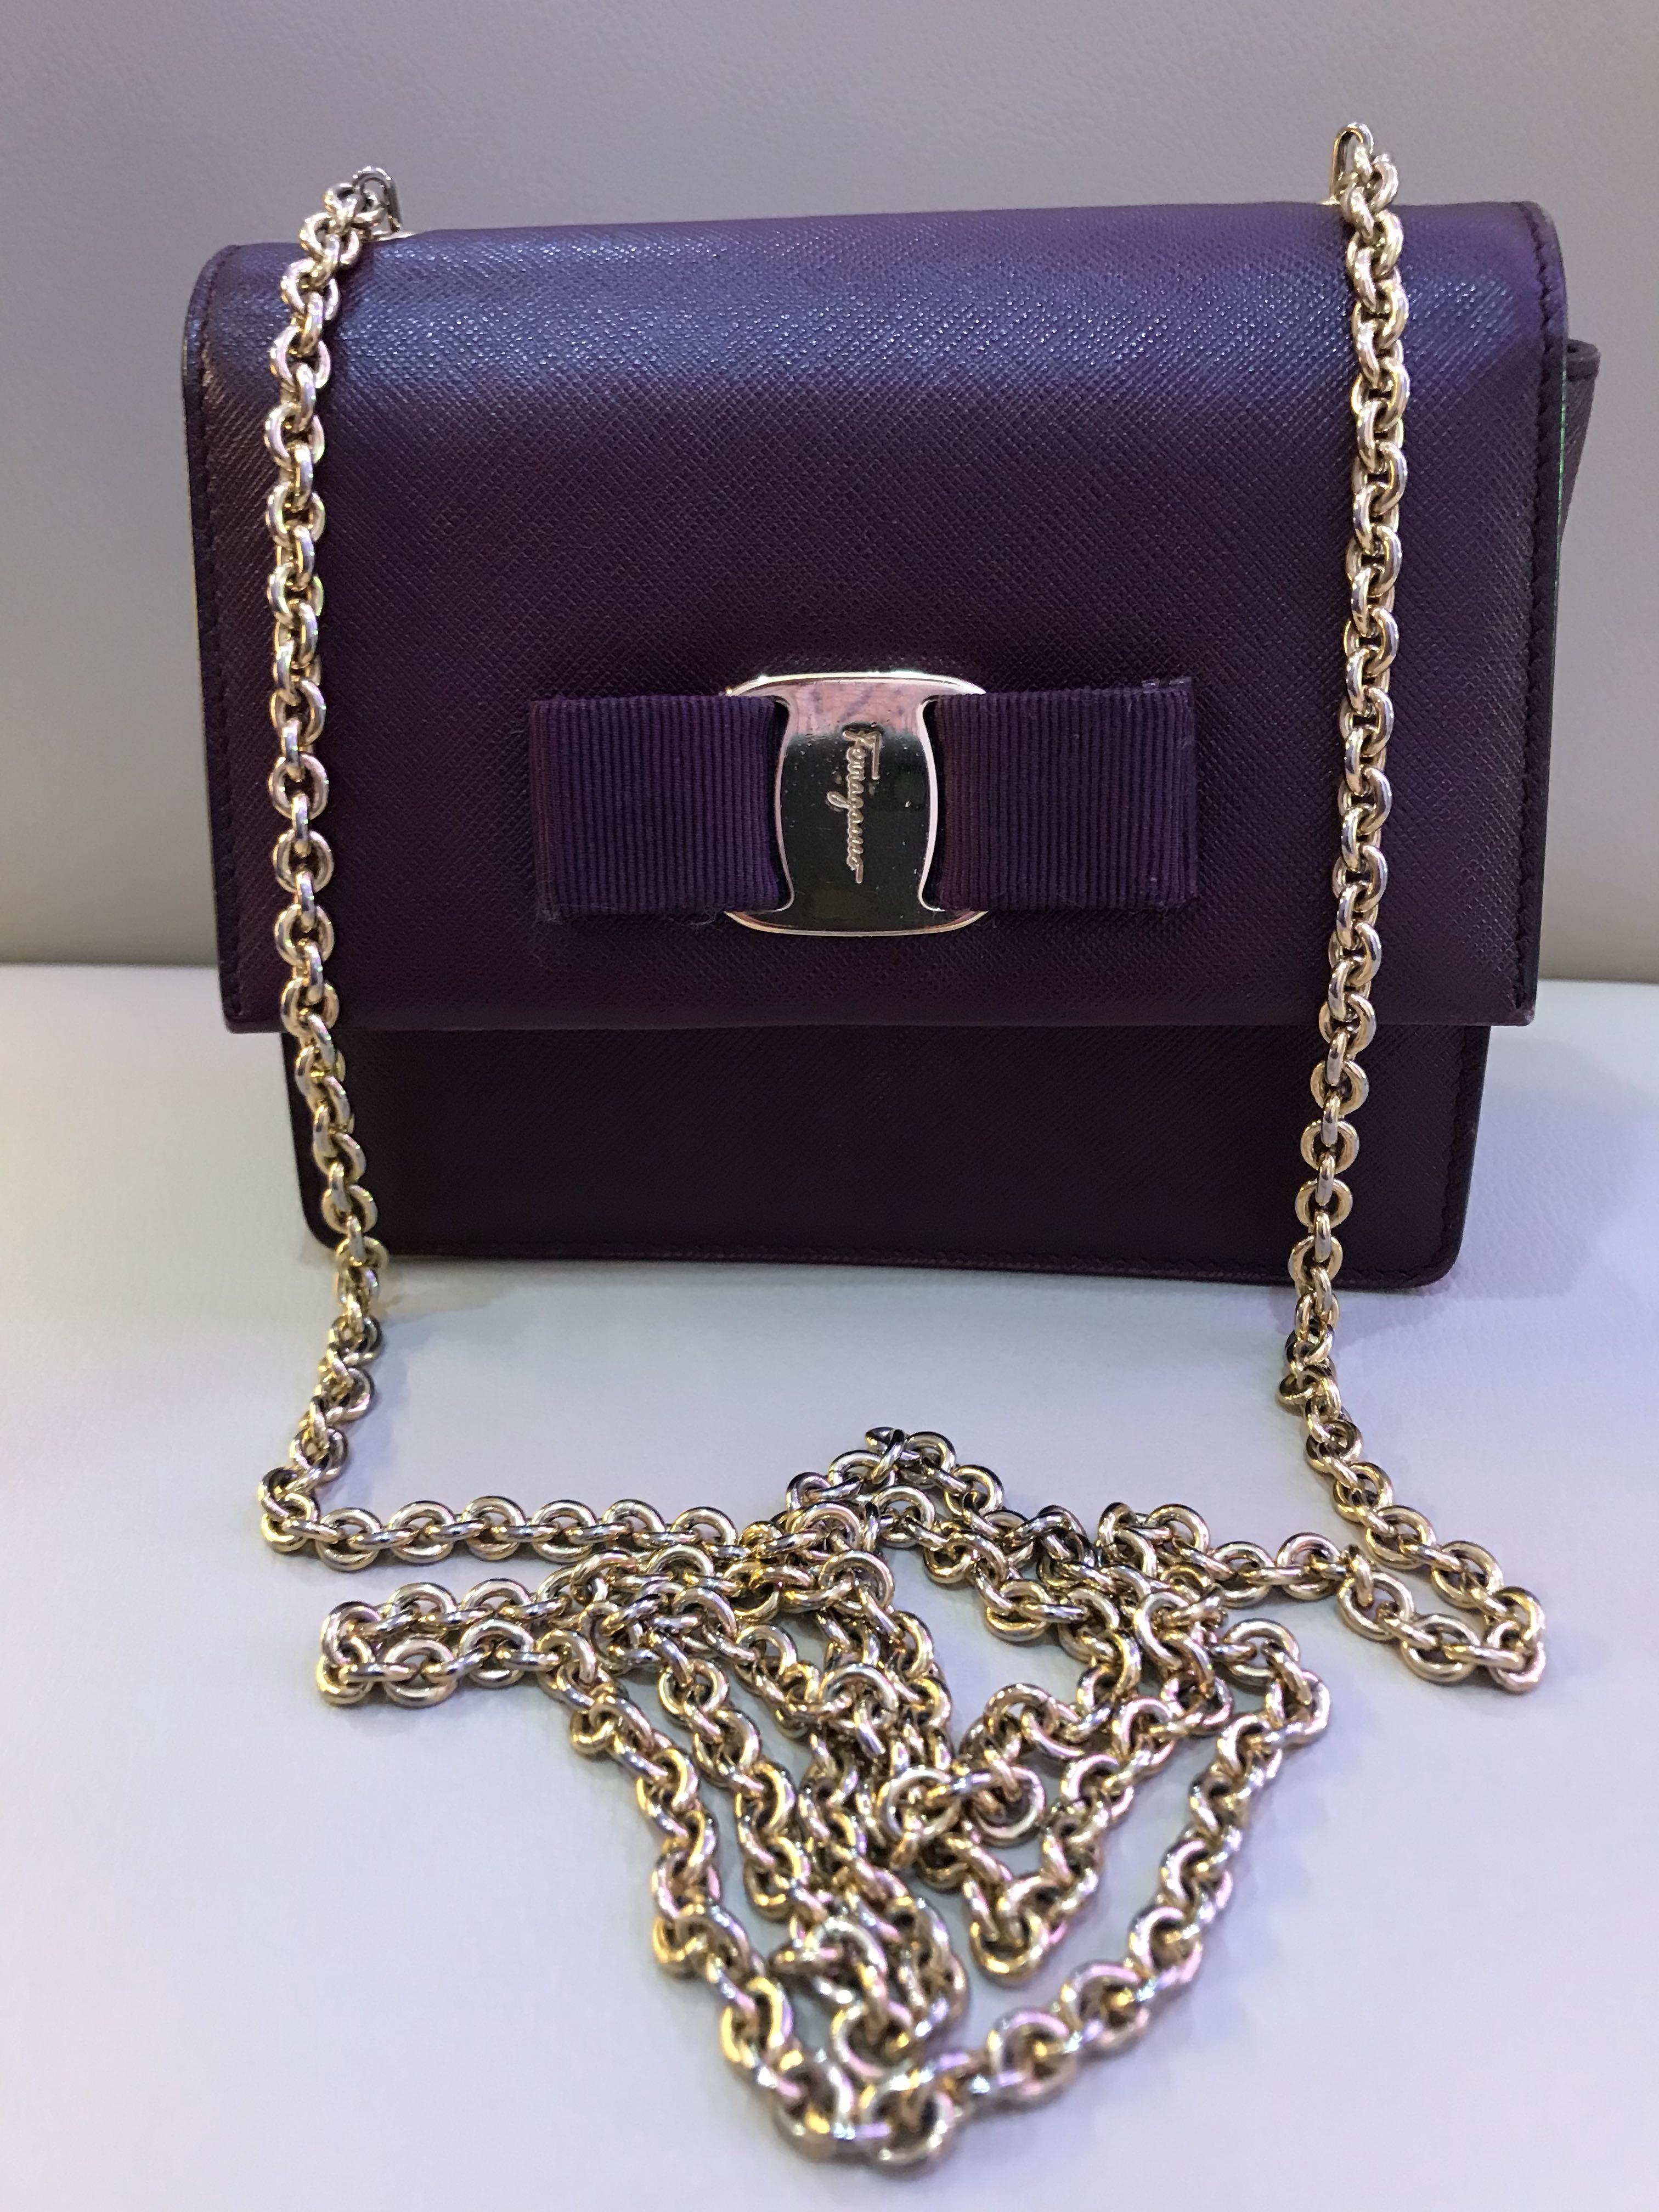 8402767ea9 Home · Luxury · Bags   Wallets · Sling Bags. photo photo ...